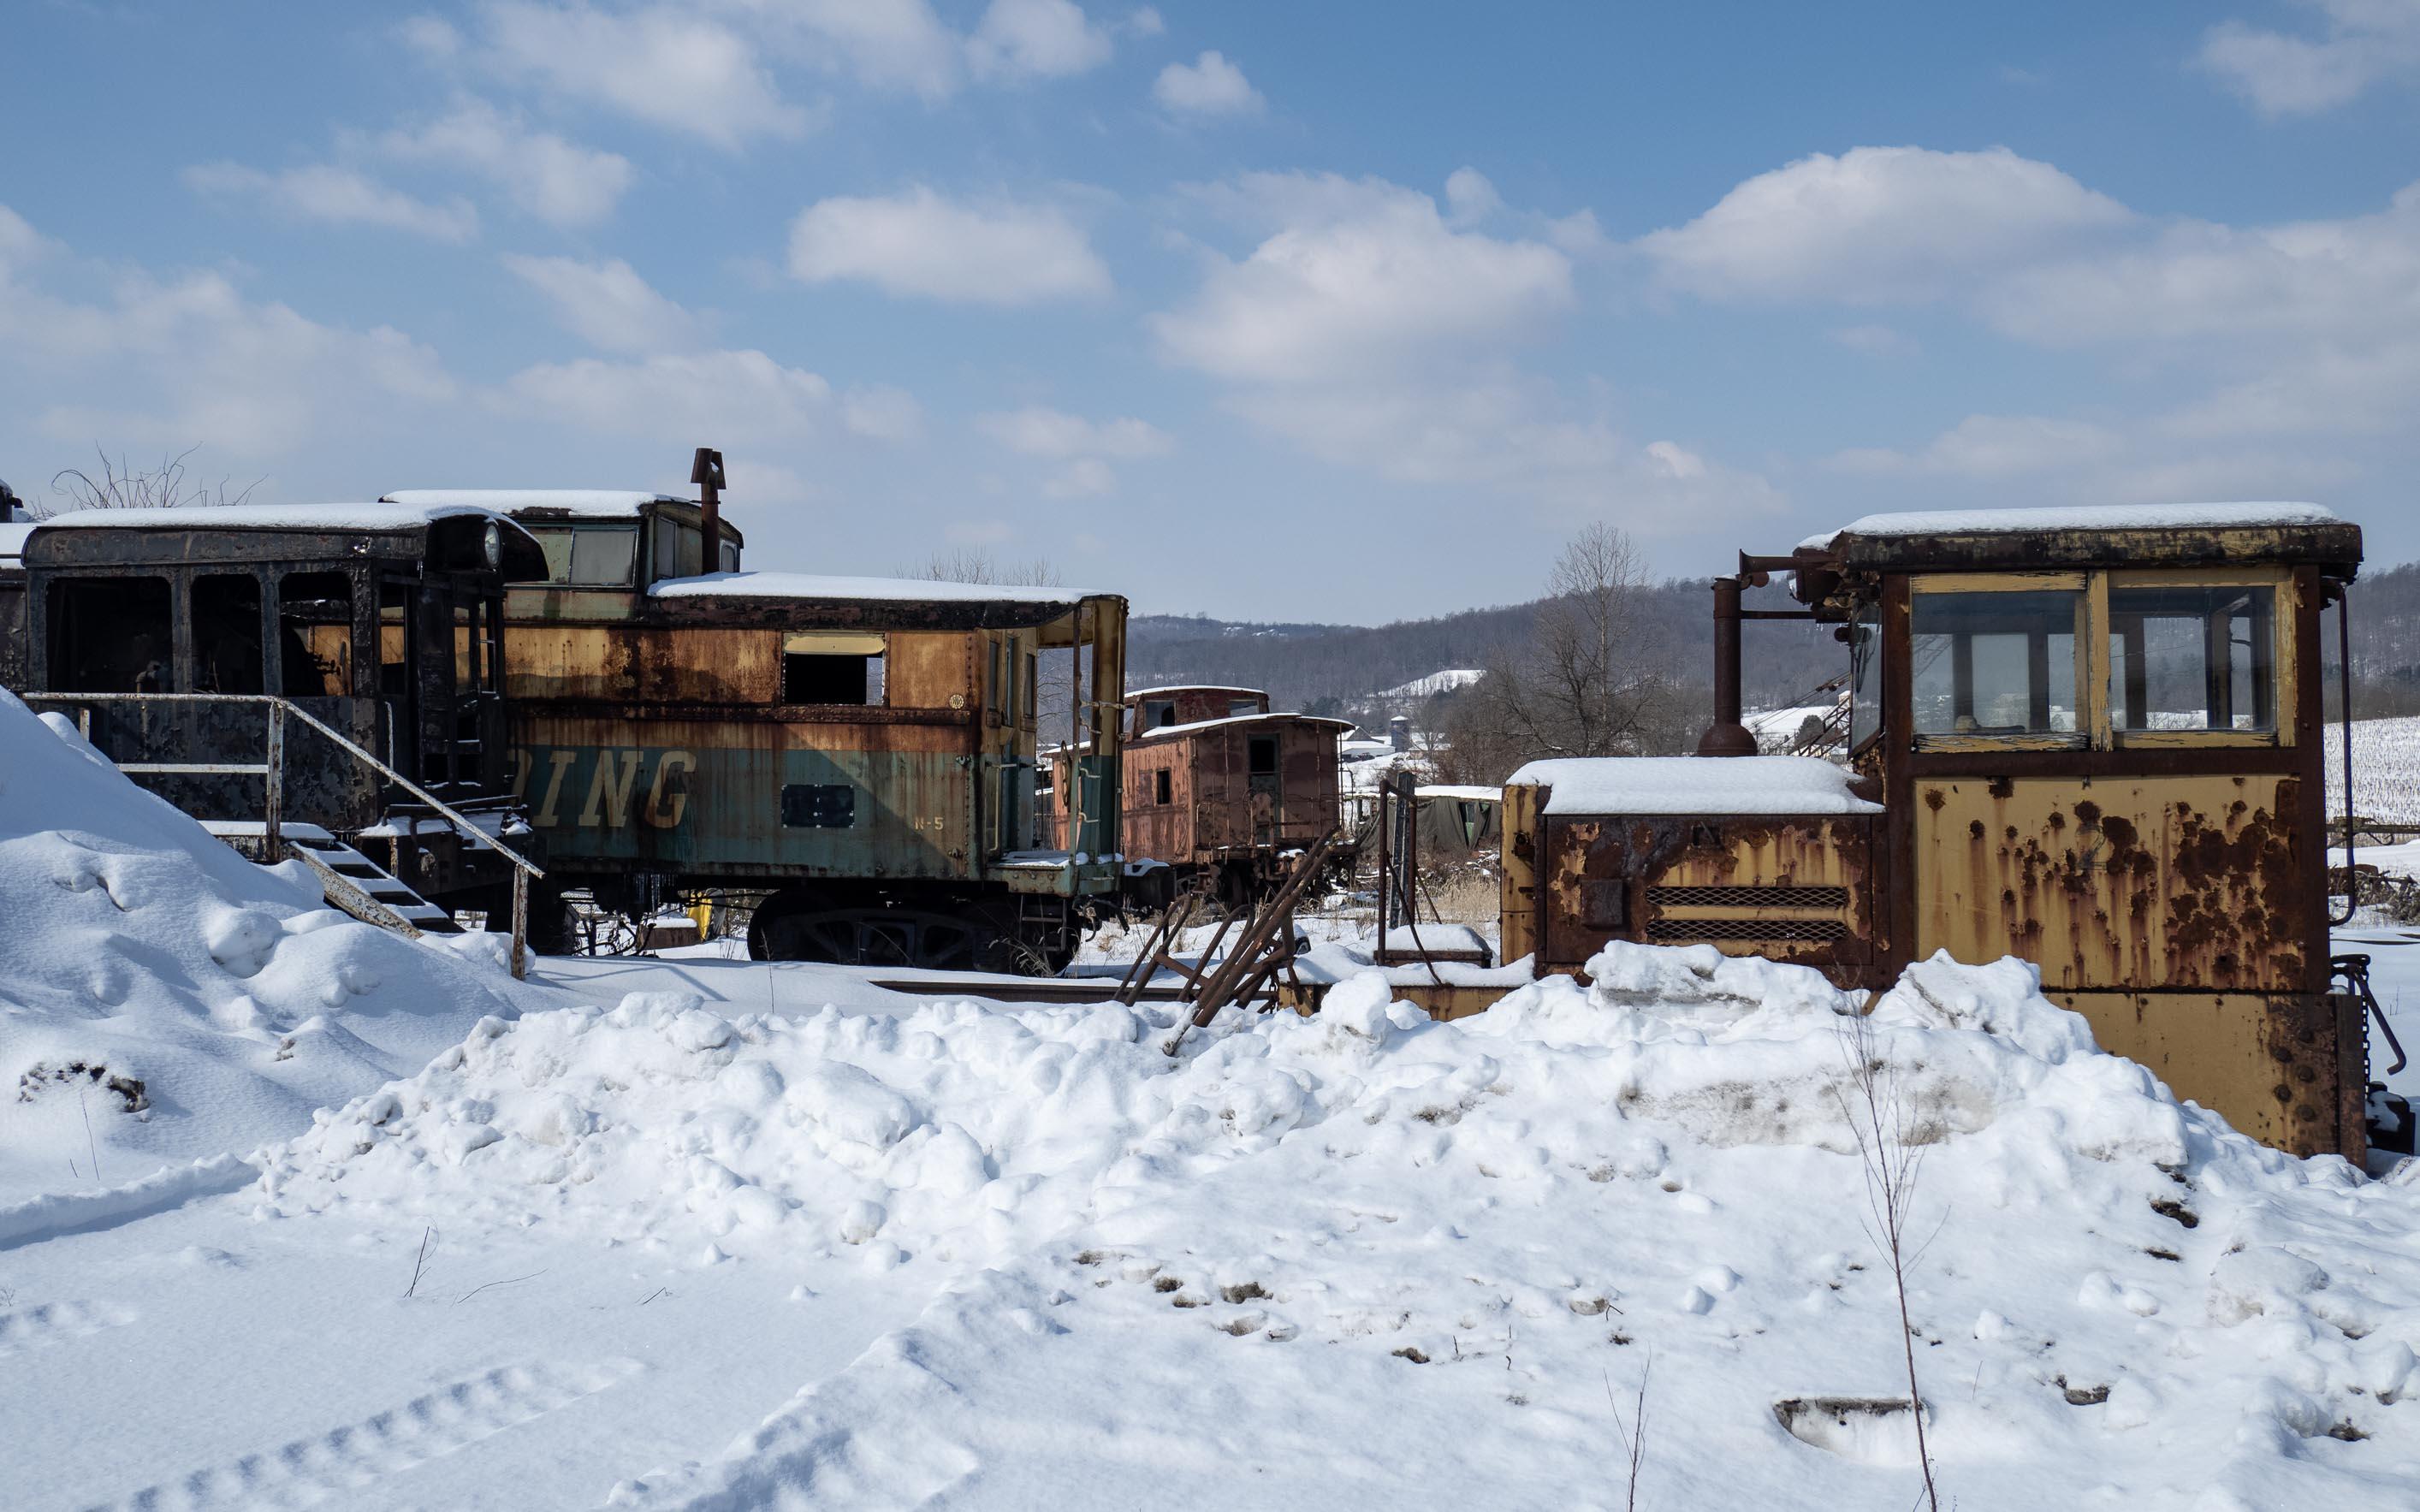 Train!